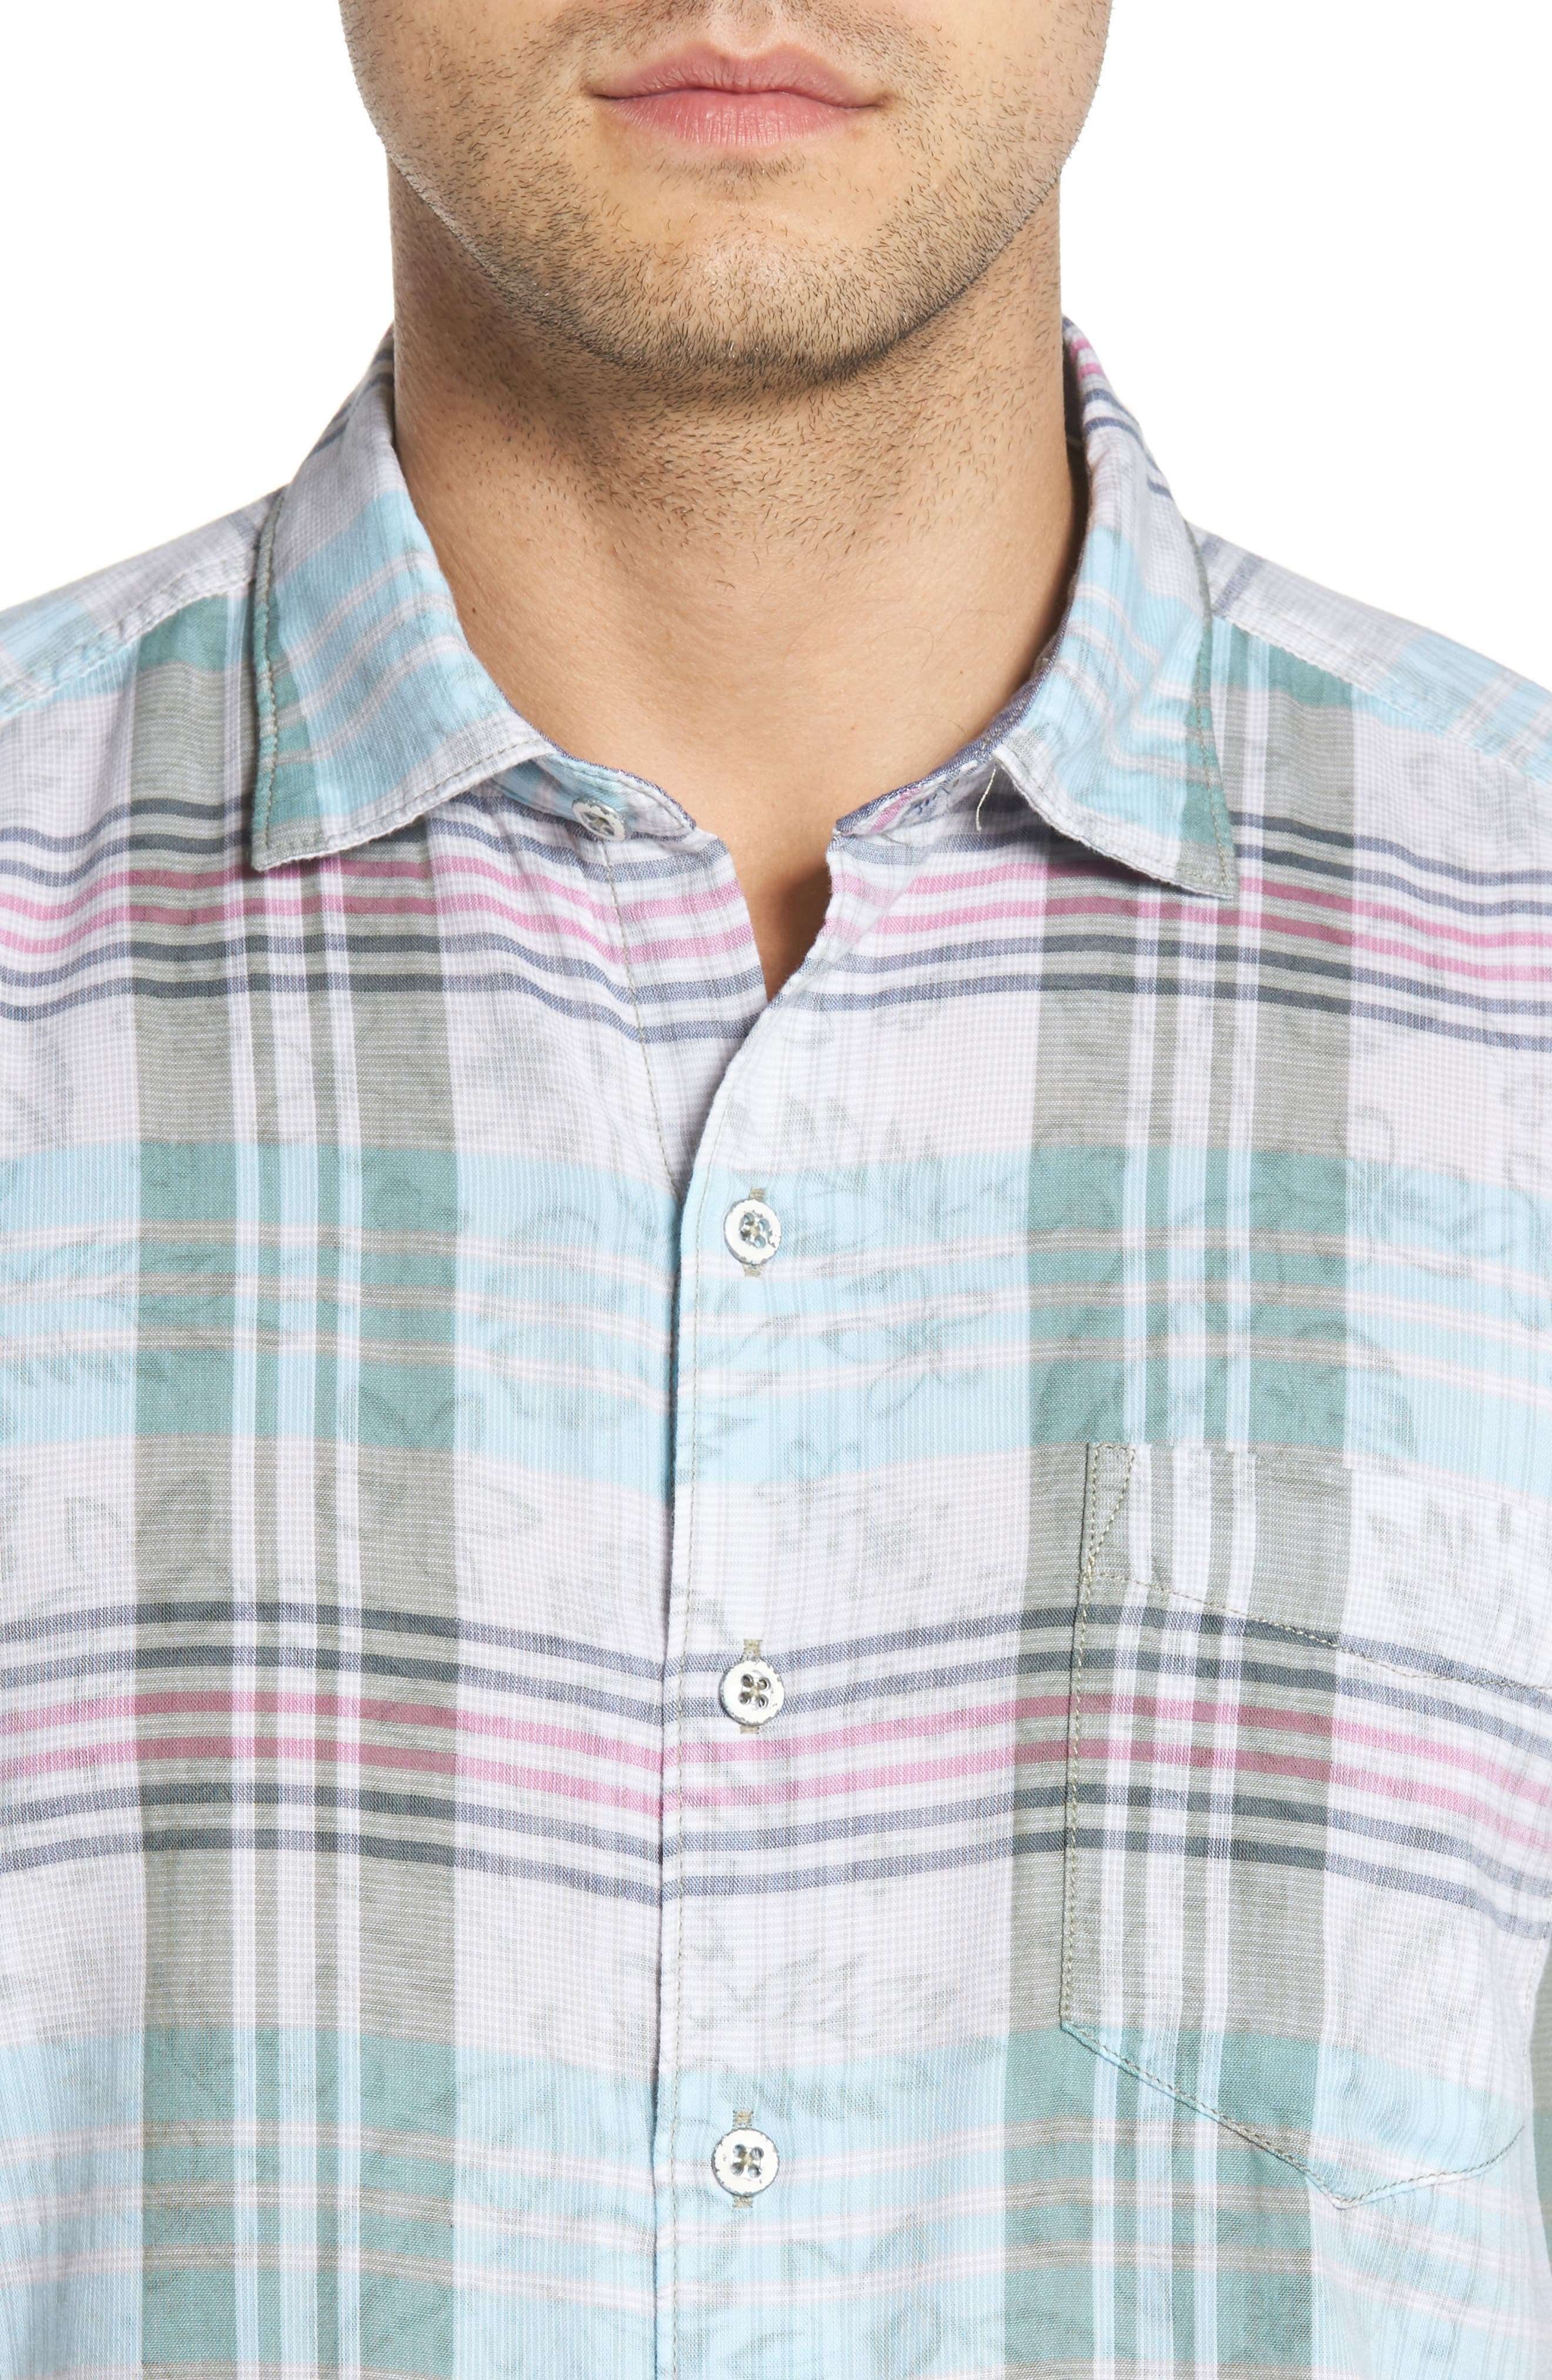 Zuma Plaid Sport Shirt,                             Alternate thumbnail 4, color,                             300